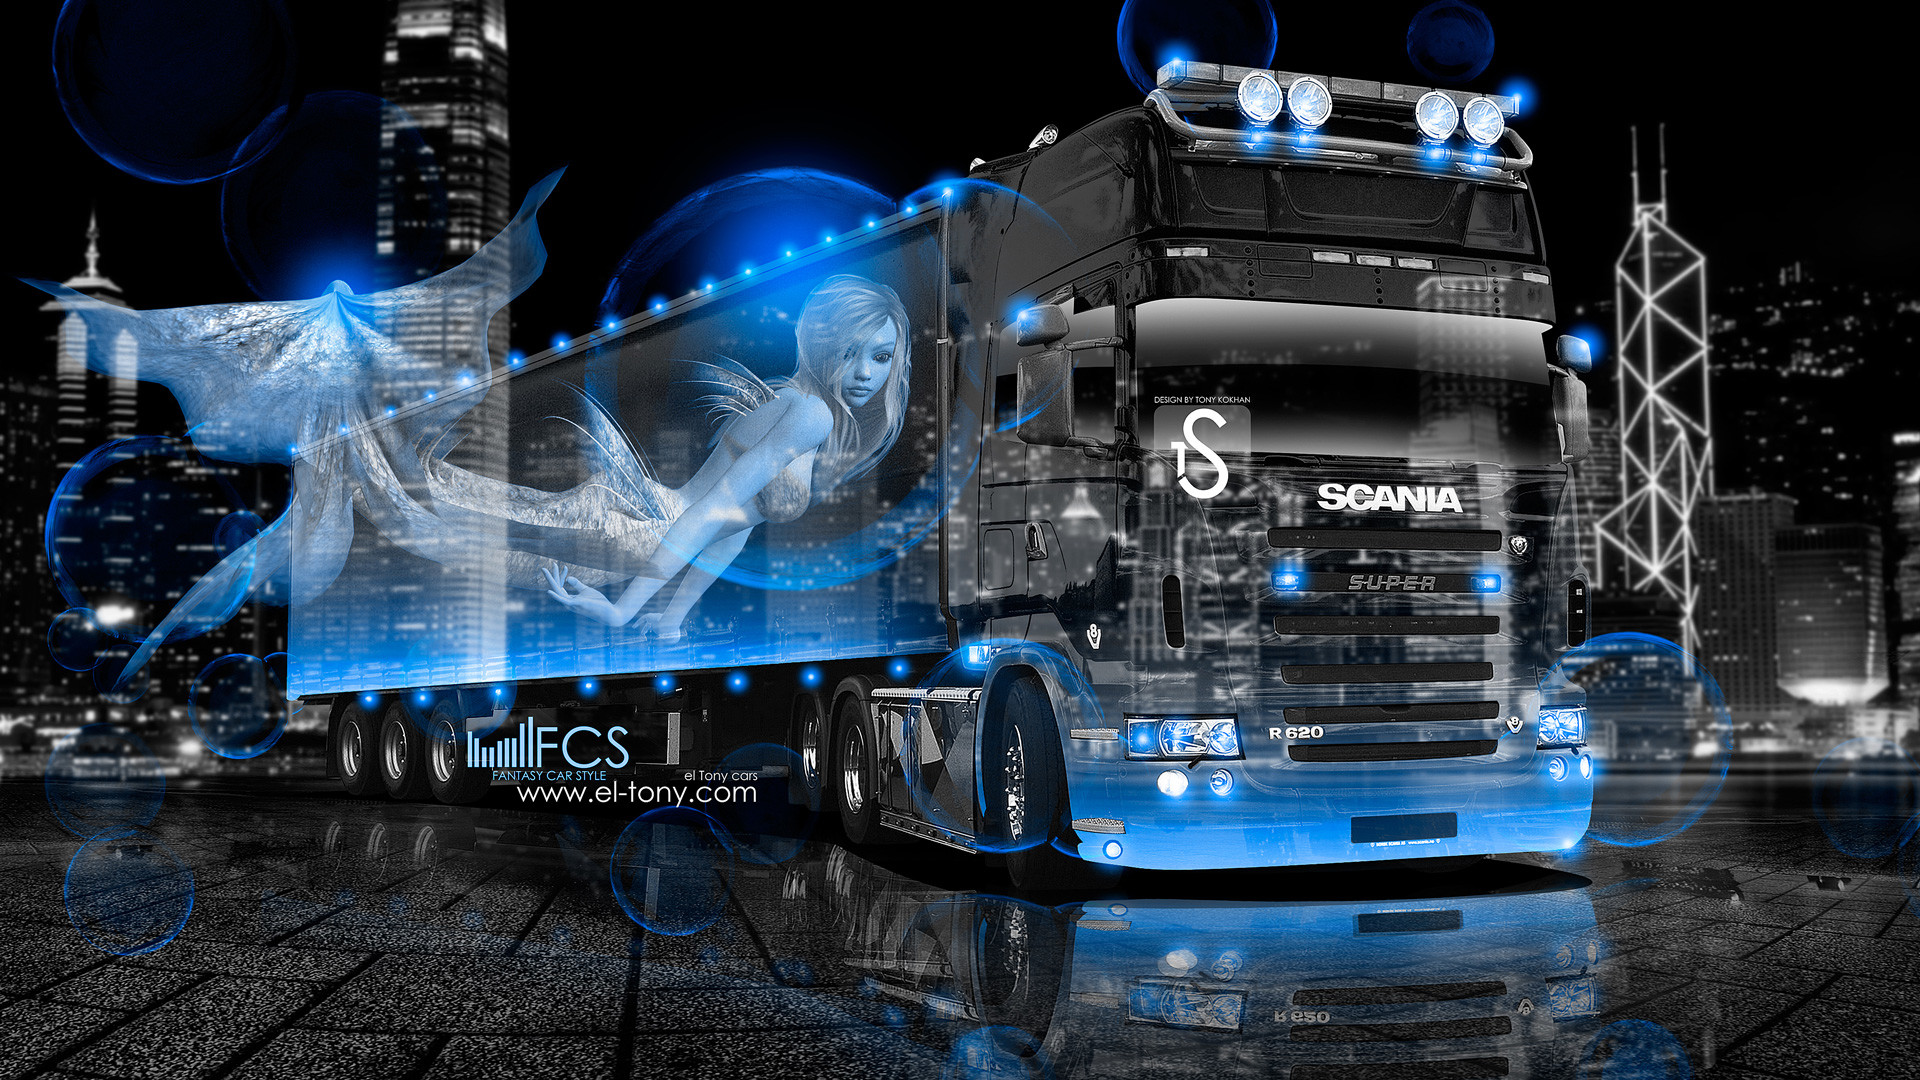 Audi Black Cars Wallpapers Scania Trucks Wallpapers 61 Images